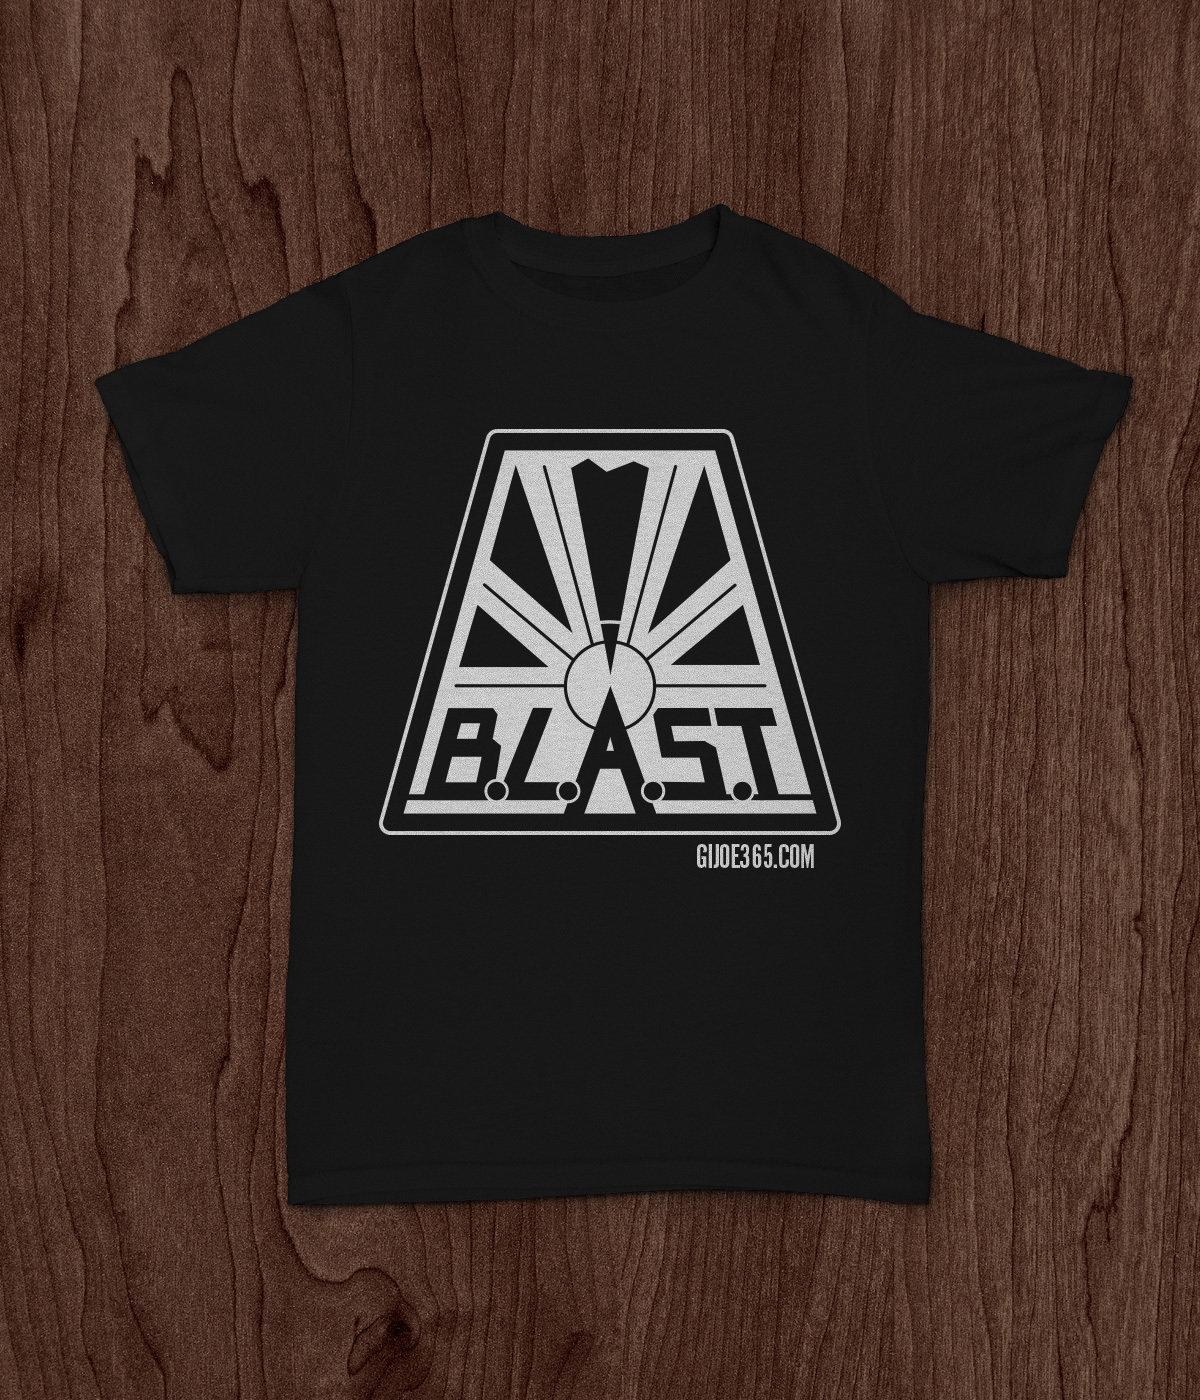 B.L.A.S.T. Exclusive T-shirt